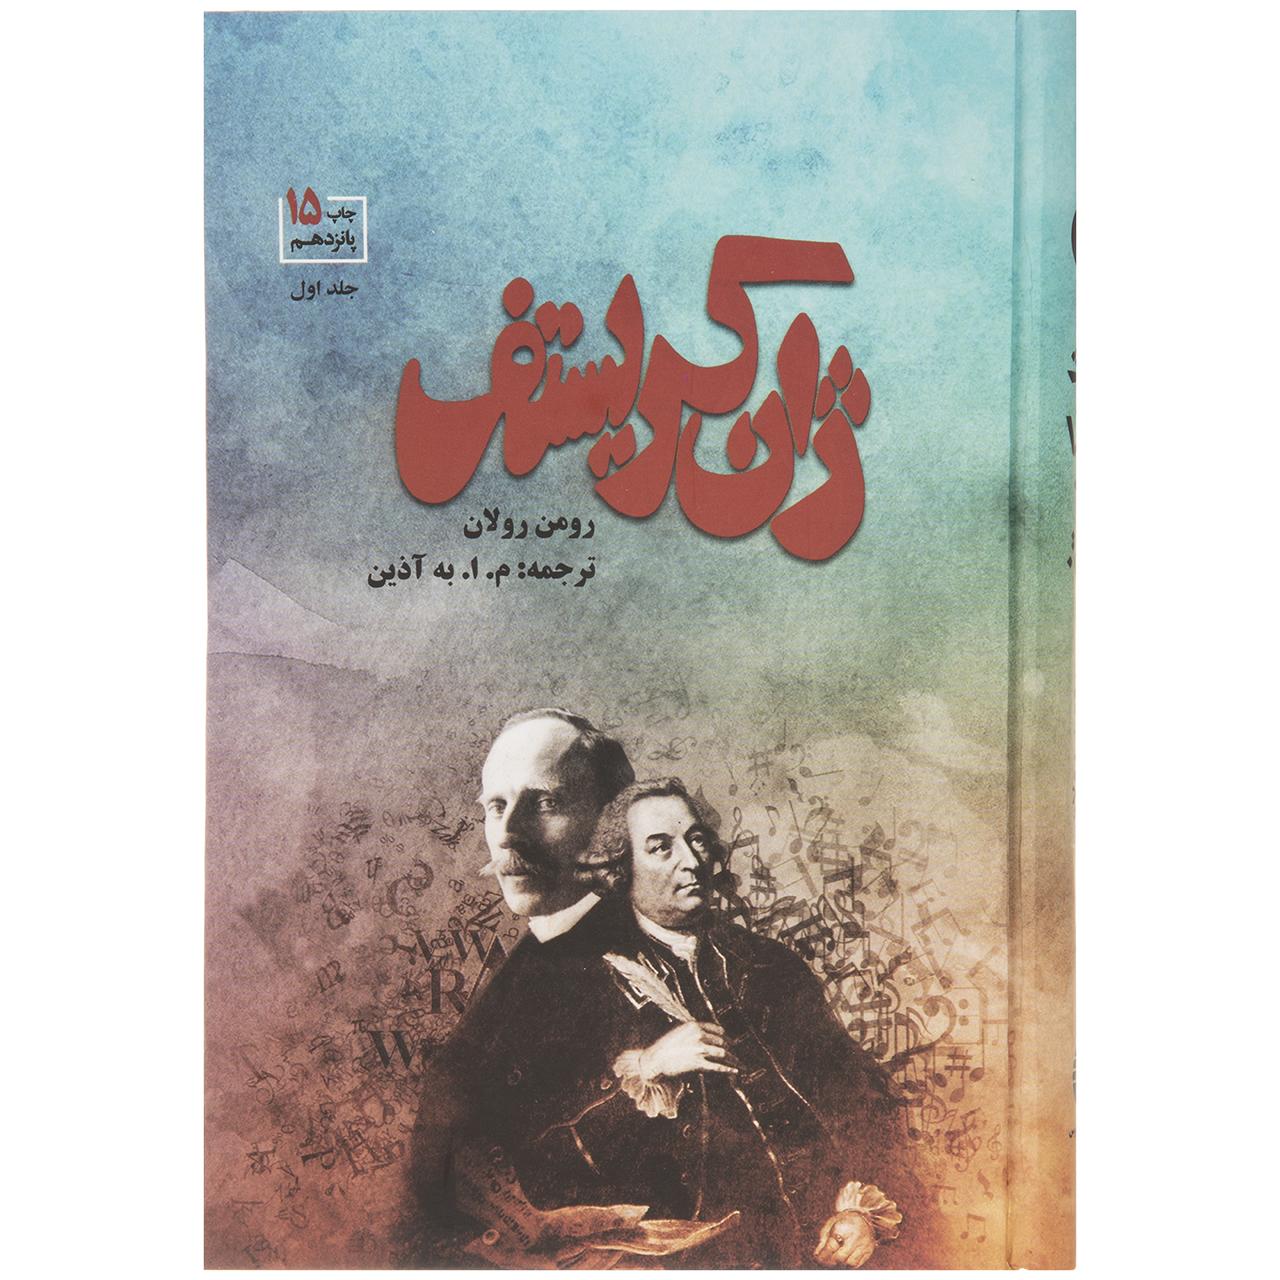 کتاب ژان کریستف اثر رومن رولان - 4 جلدی